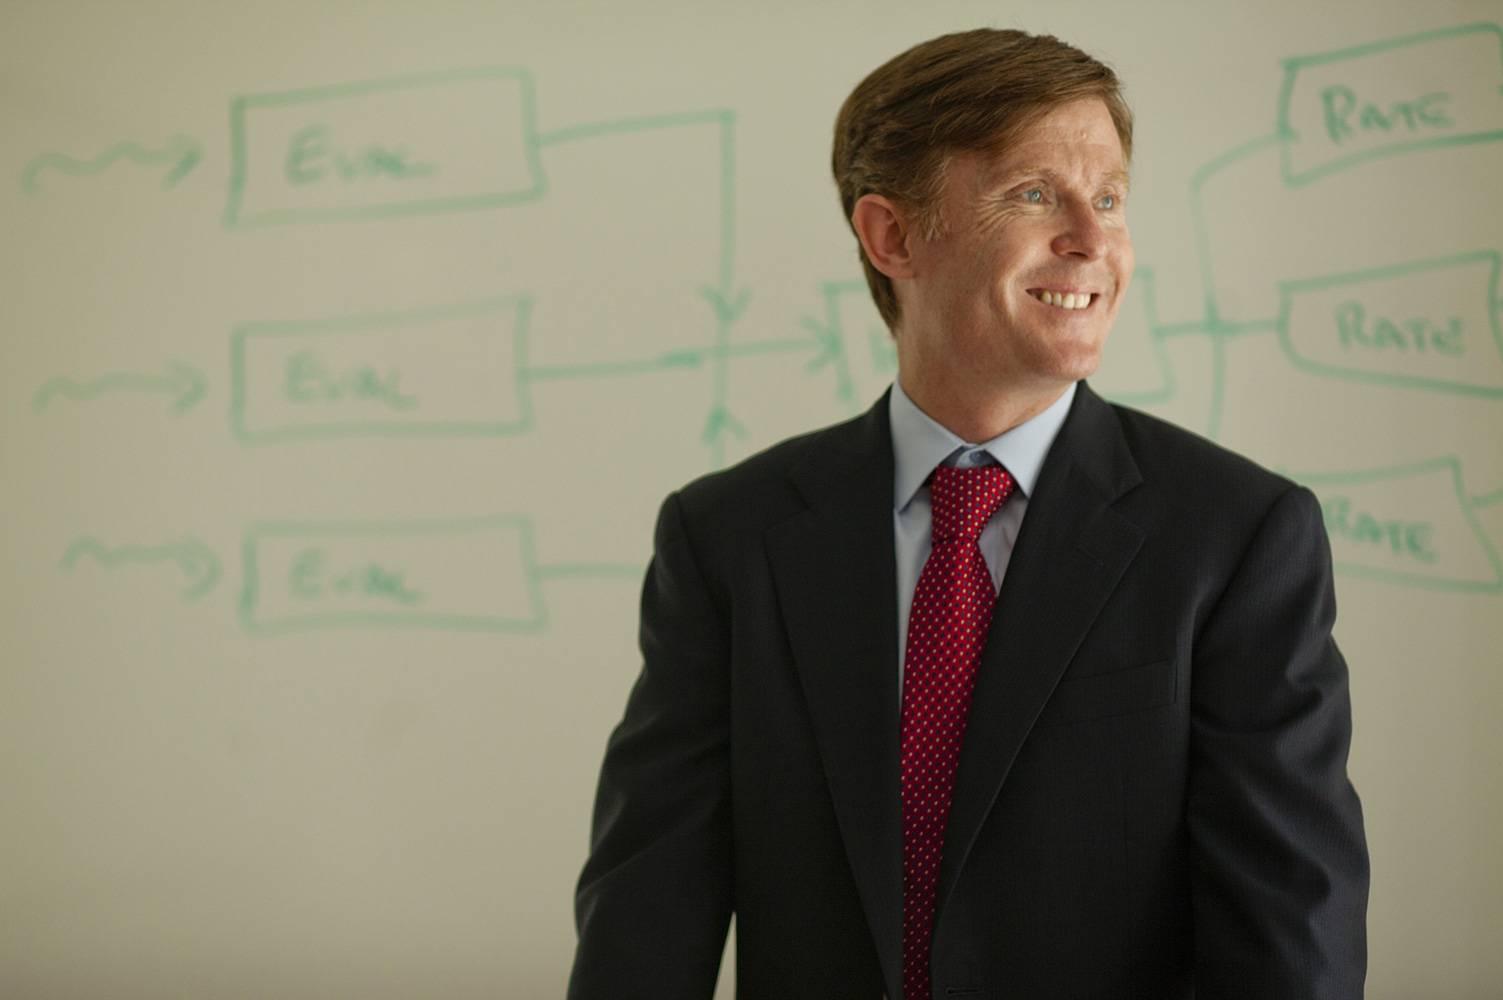 Brian Tomlin, Named the William and Josephine Buchanan Professor of Management